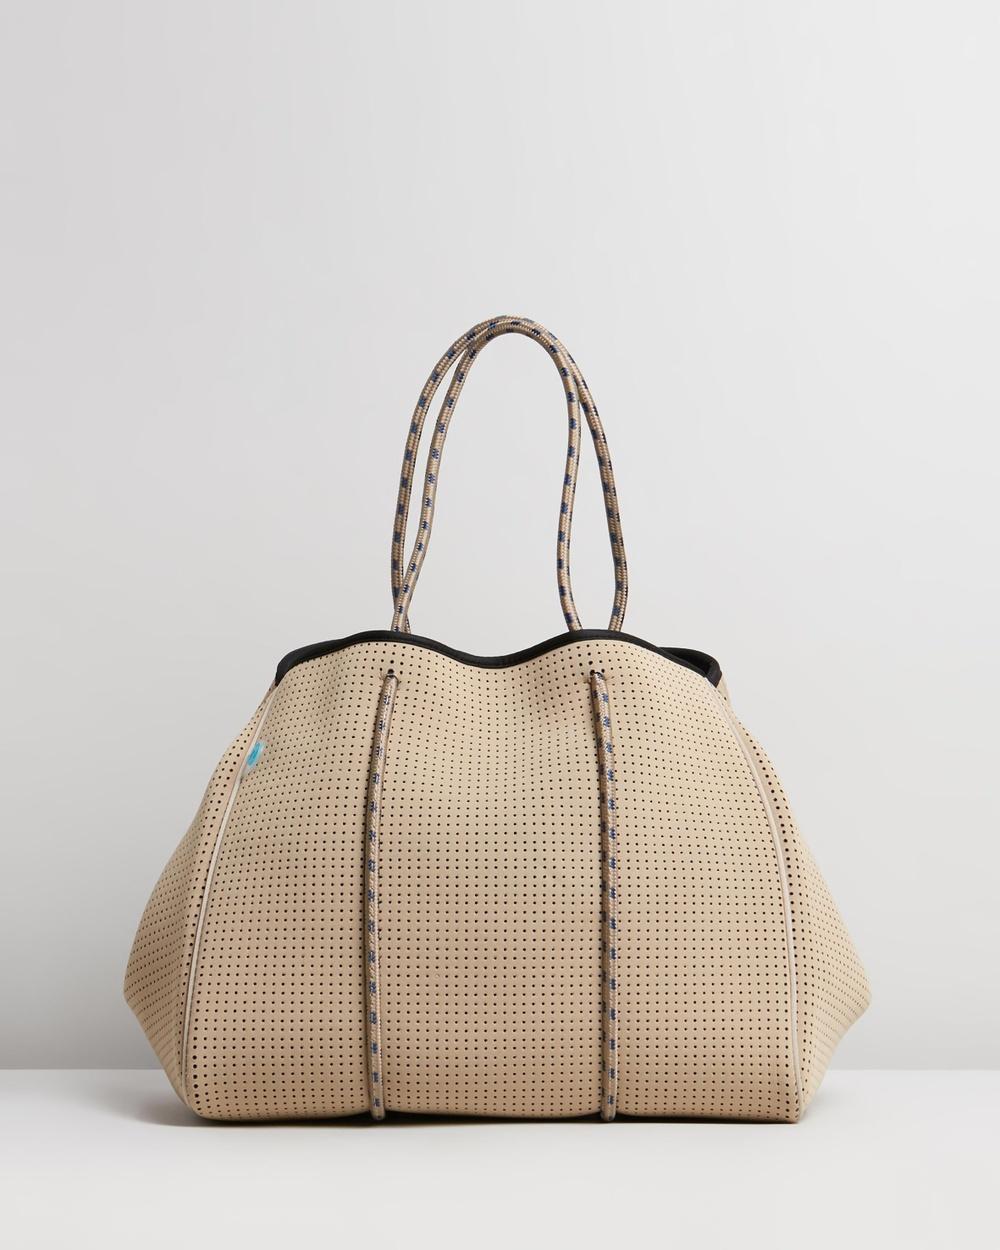 Chuchka Jen Neoprene Tote Bag Beach Bags Natural Neoprene, Brown Navy Rope & Internal